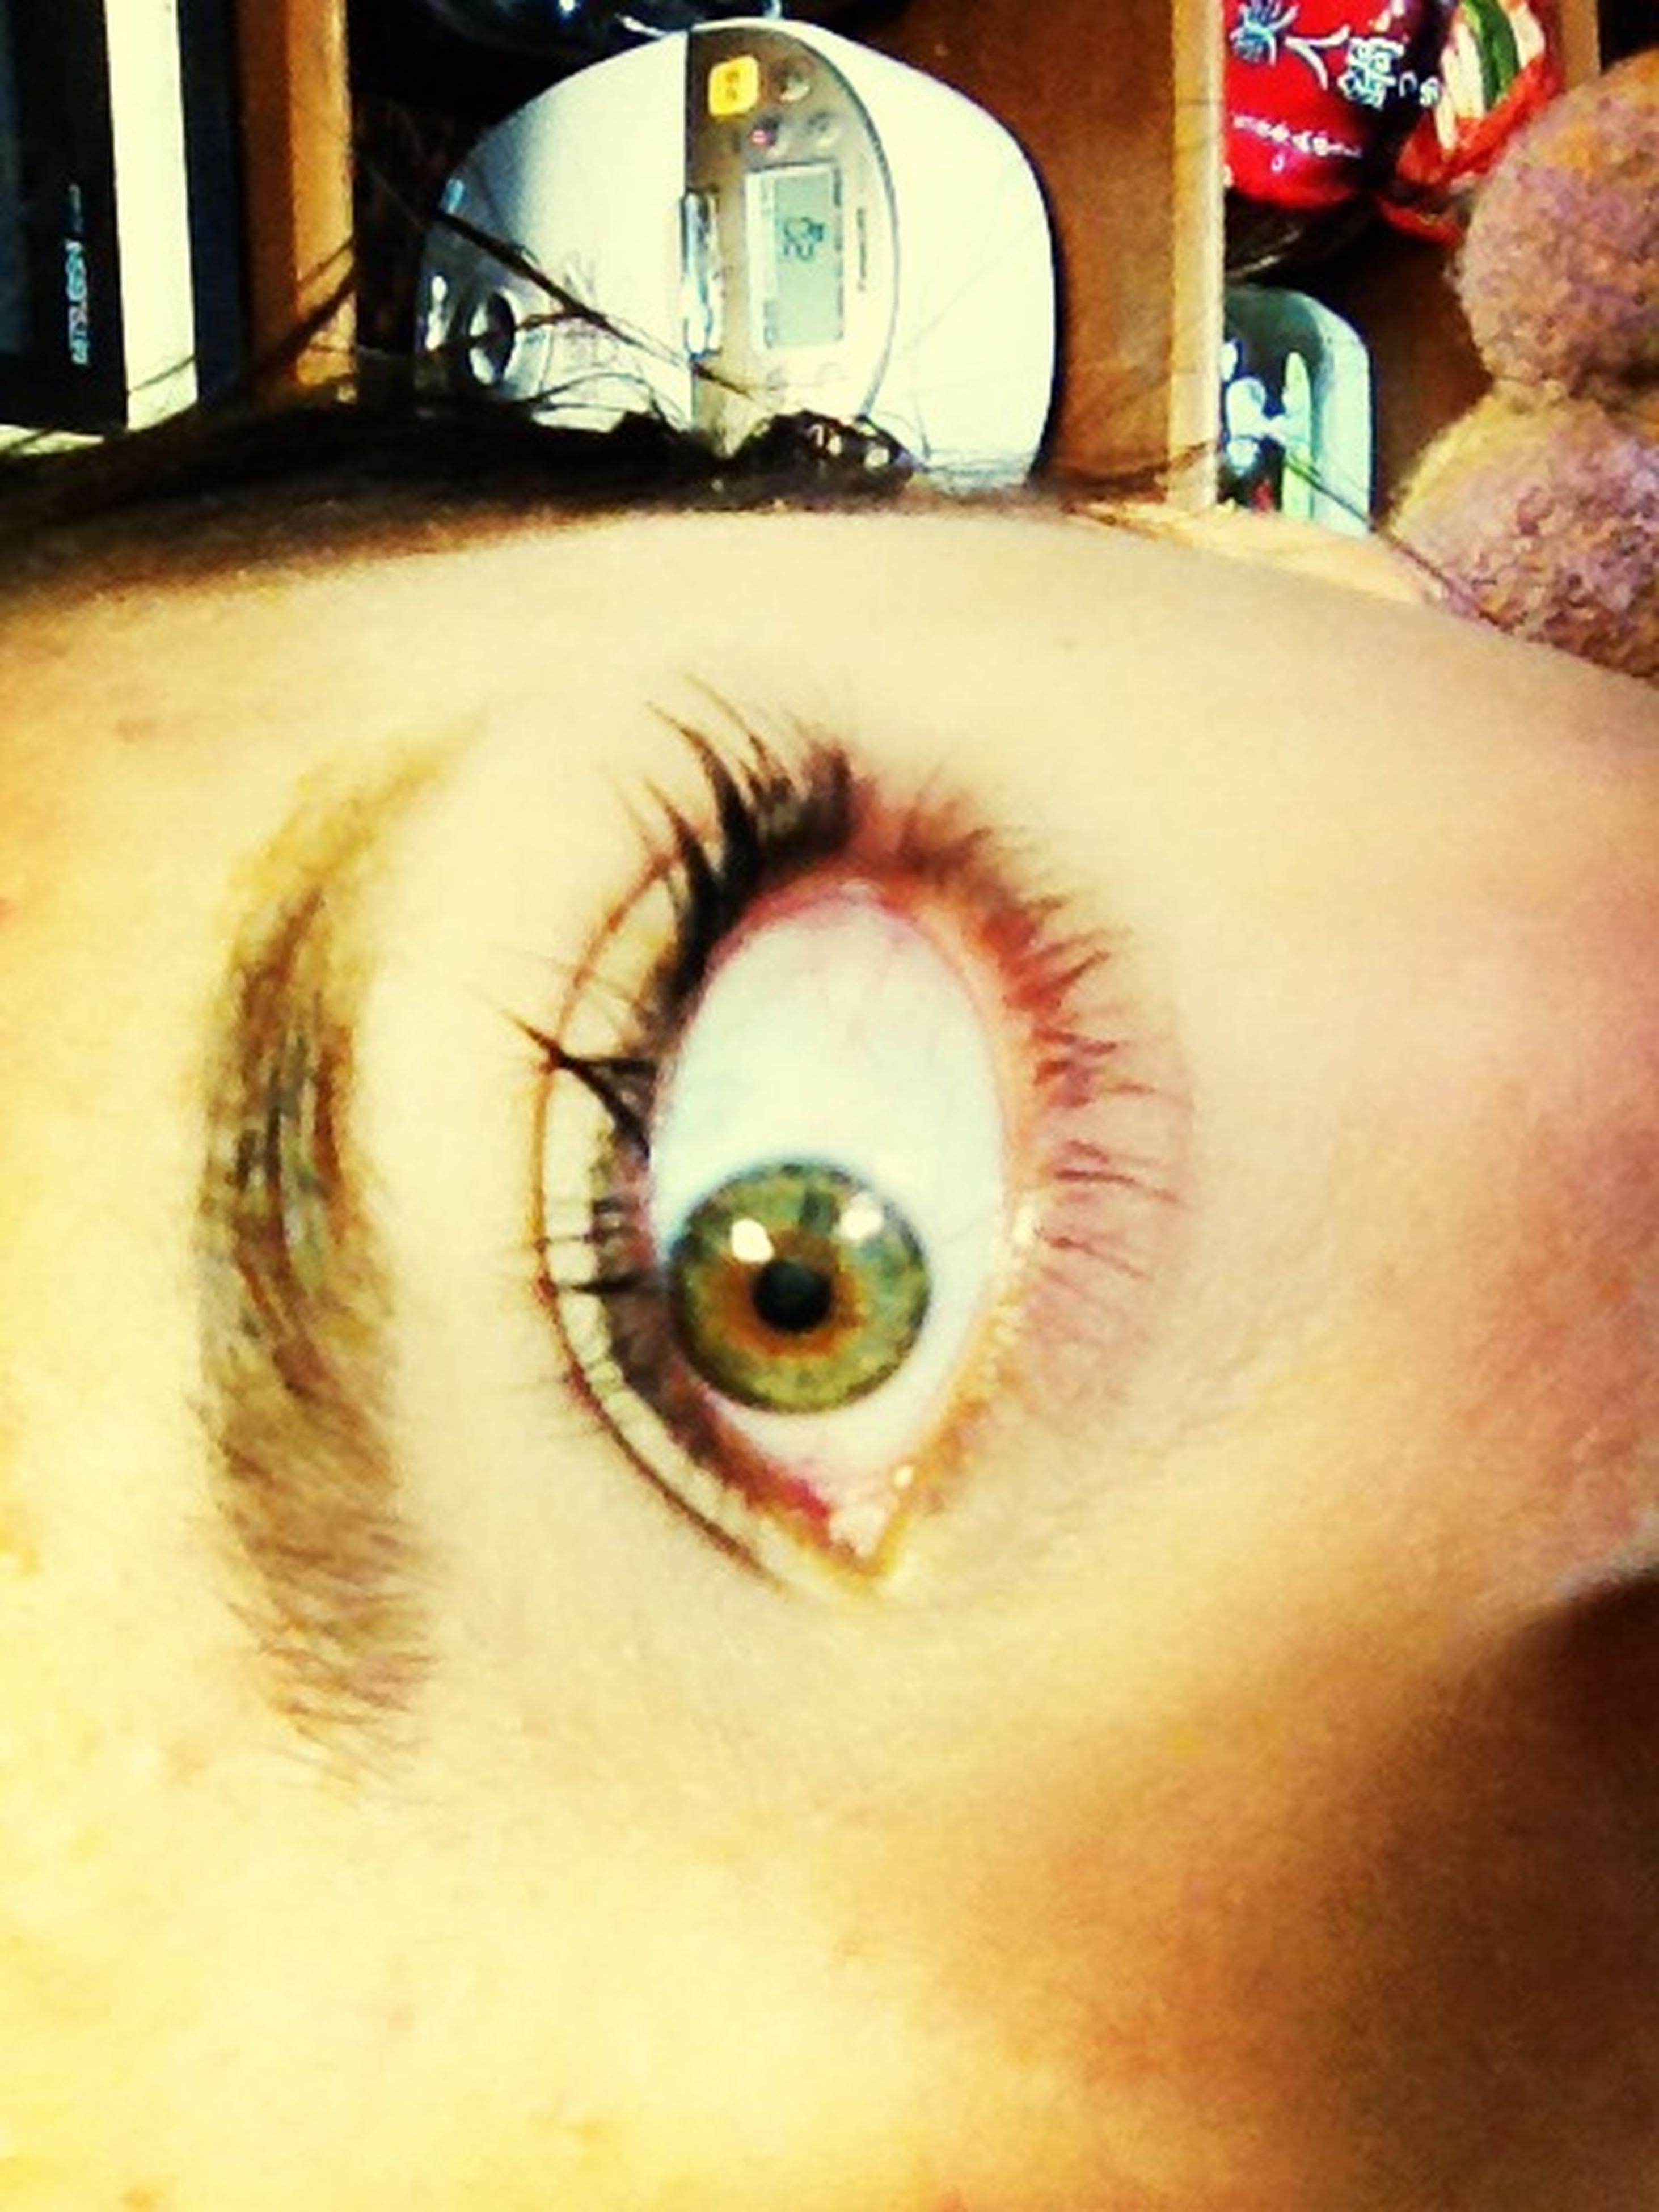 close-up, human eye, looking at camera, indoors, part of, portrait, lifestyles, human face, eyesight, reflection, headshot, leisure activity, eyelash, unrecognizable person, person, cropped, sensory perception